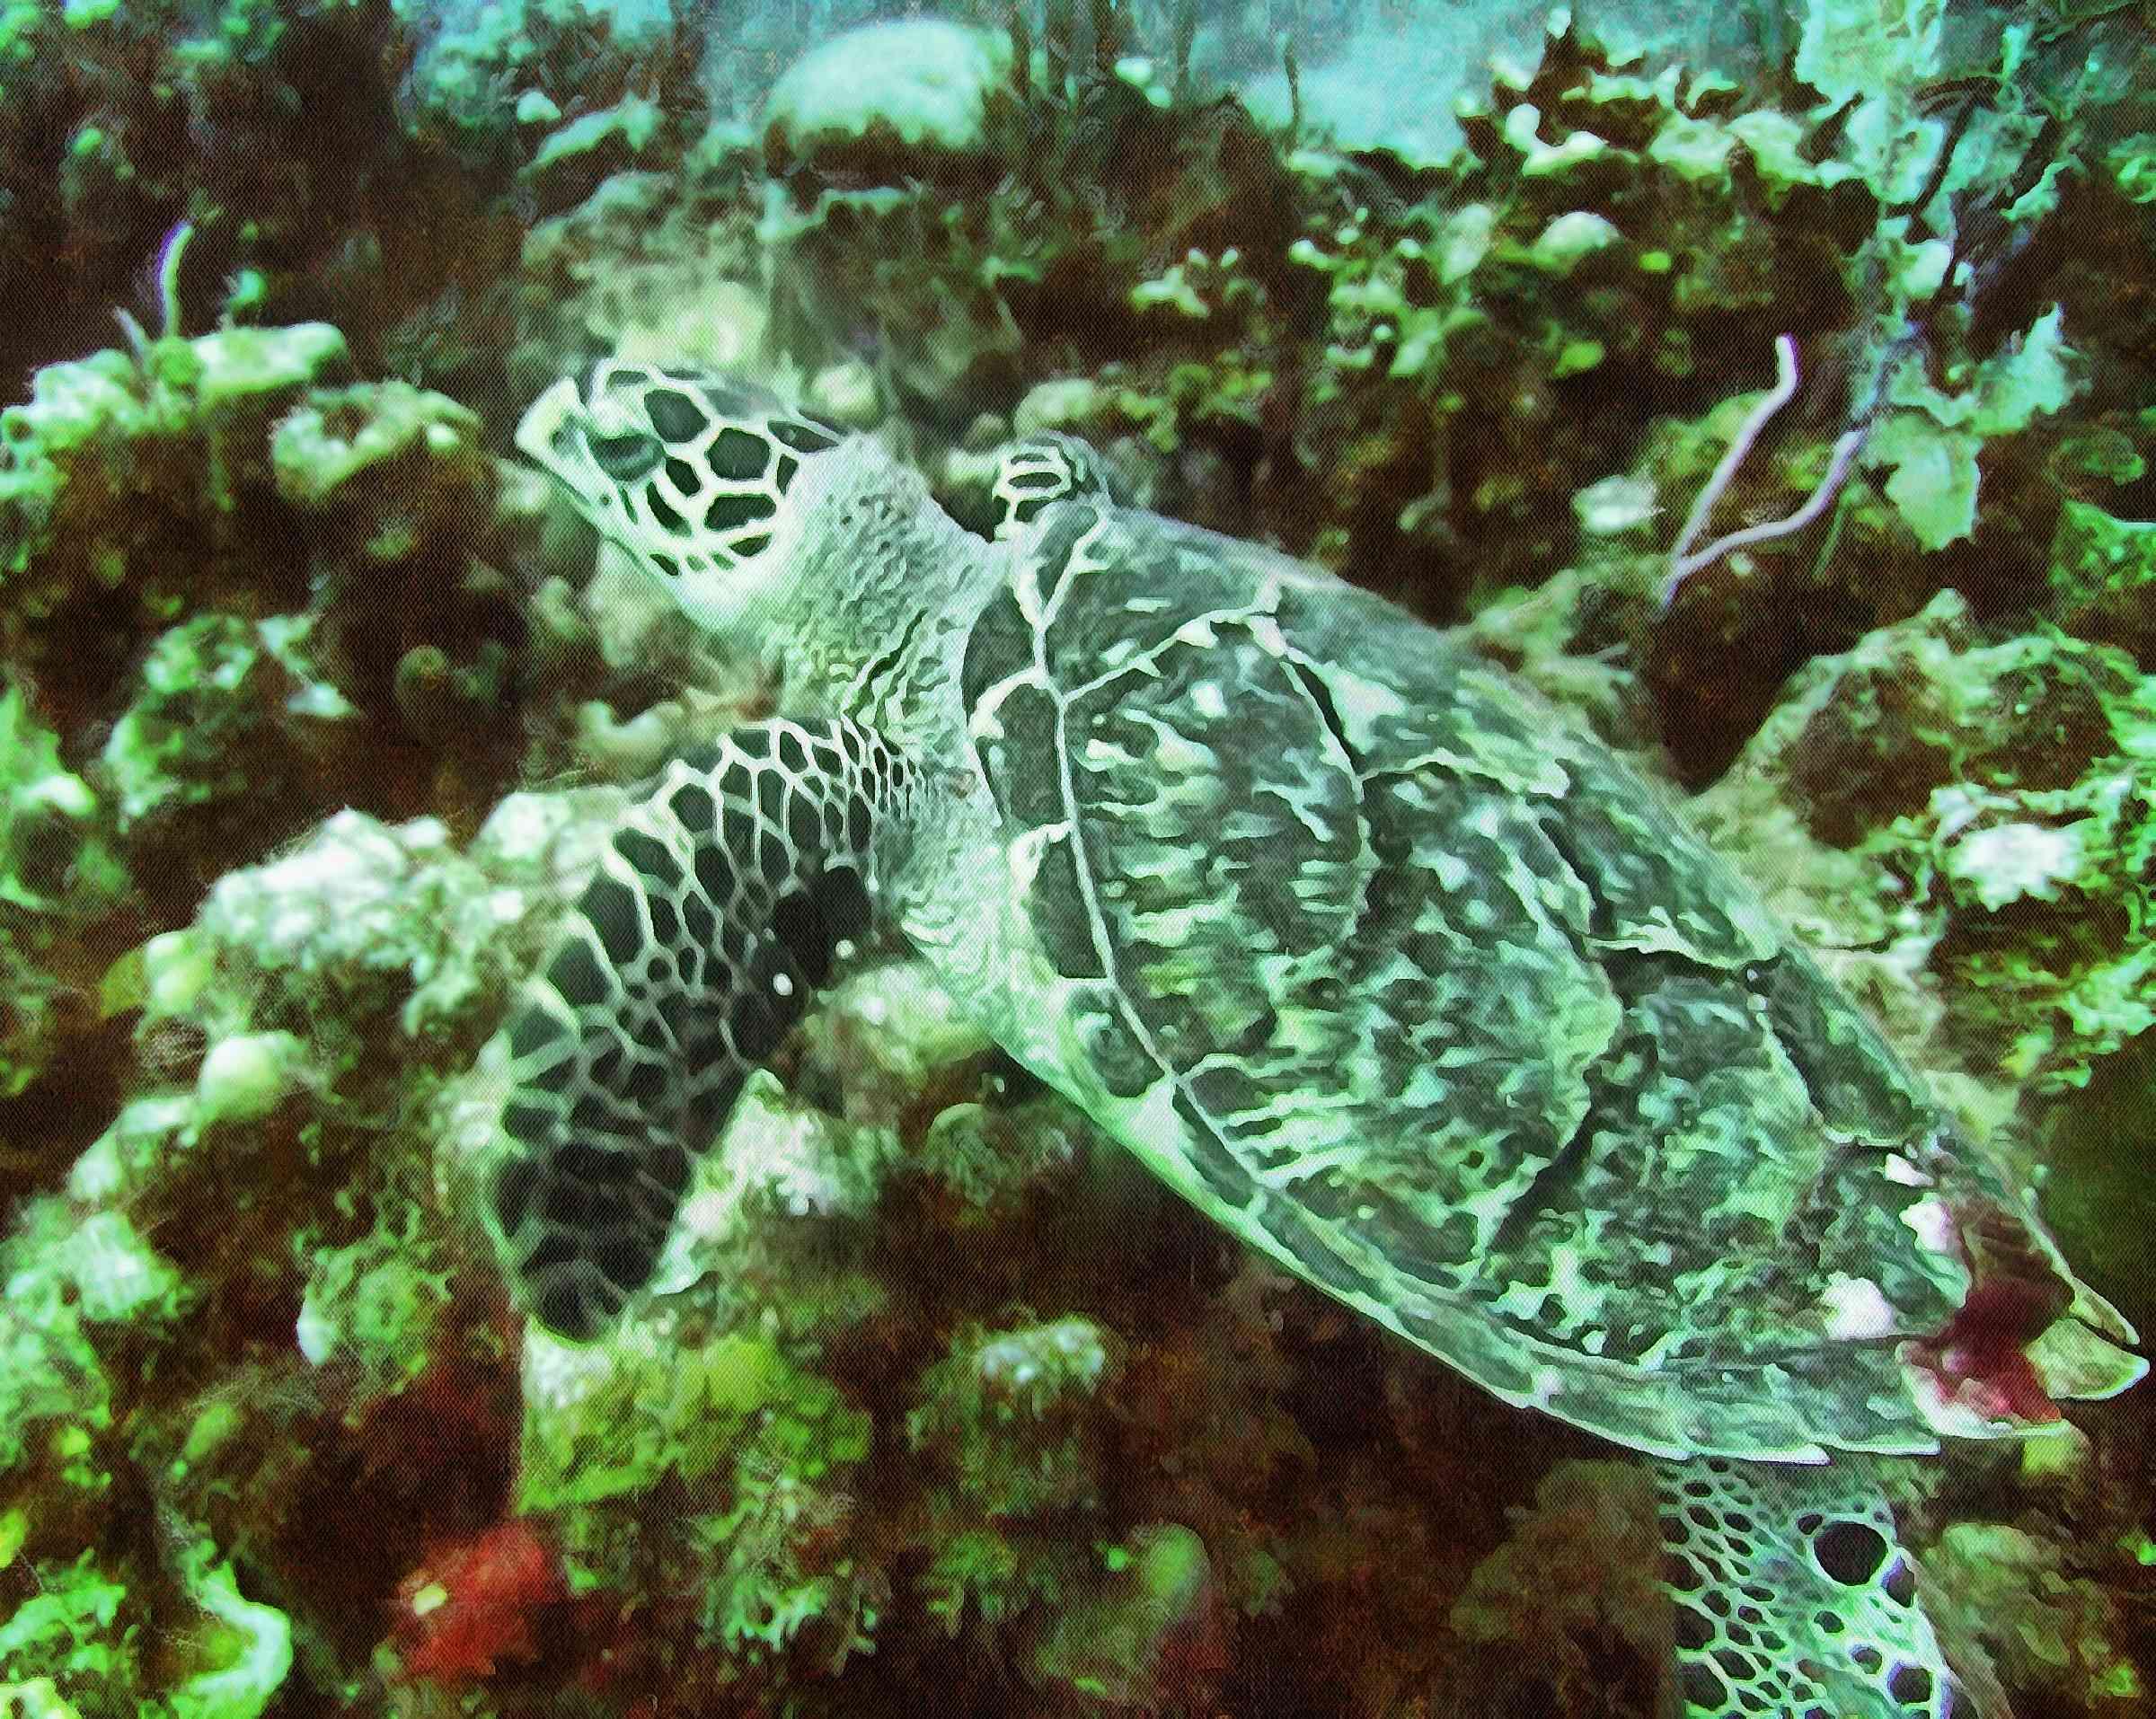 Tortoise, Turtle free images,  – Turtle public domain images, Tortoise free , Turtle stock free images, free images turtles, tortoise free , tortoise public domain images!